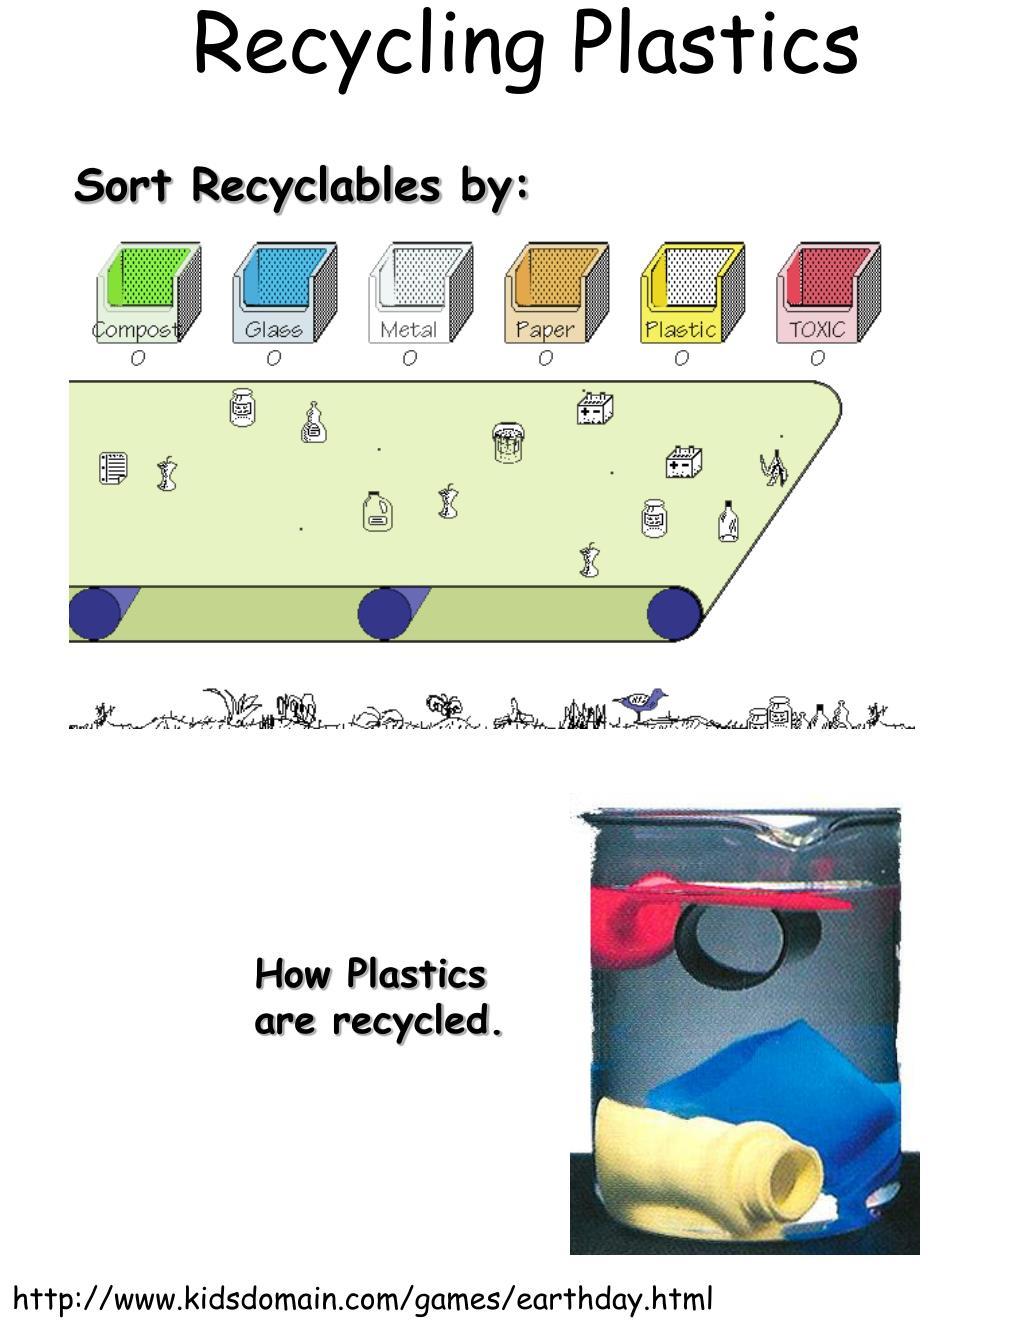 Recycling Plastics